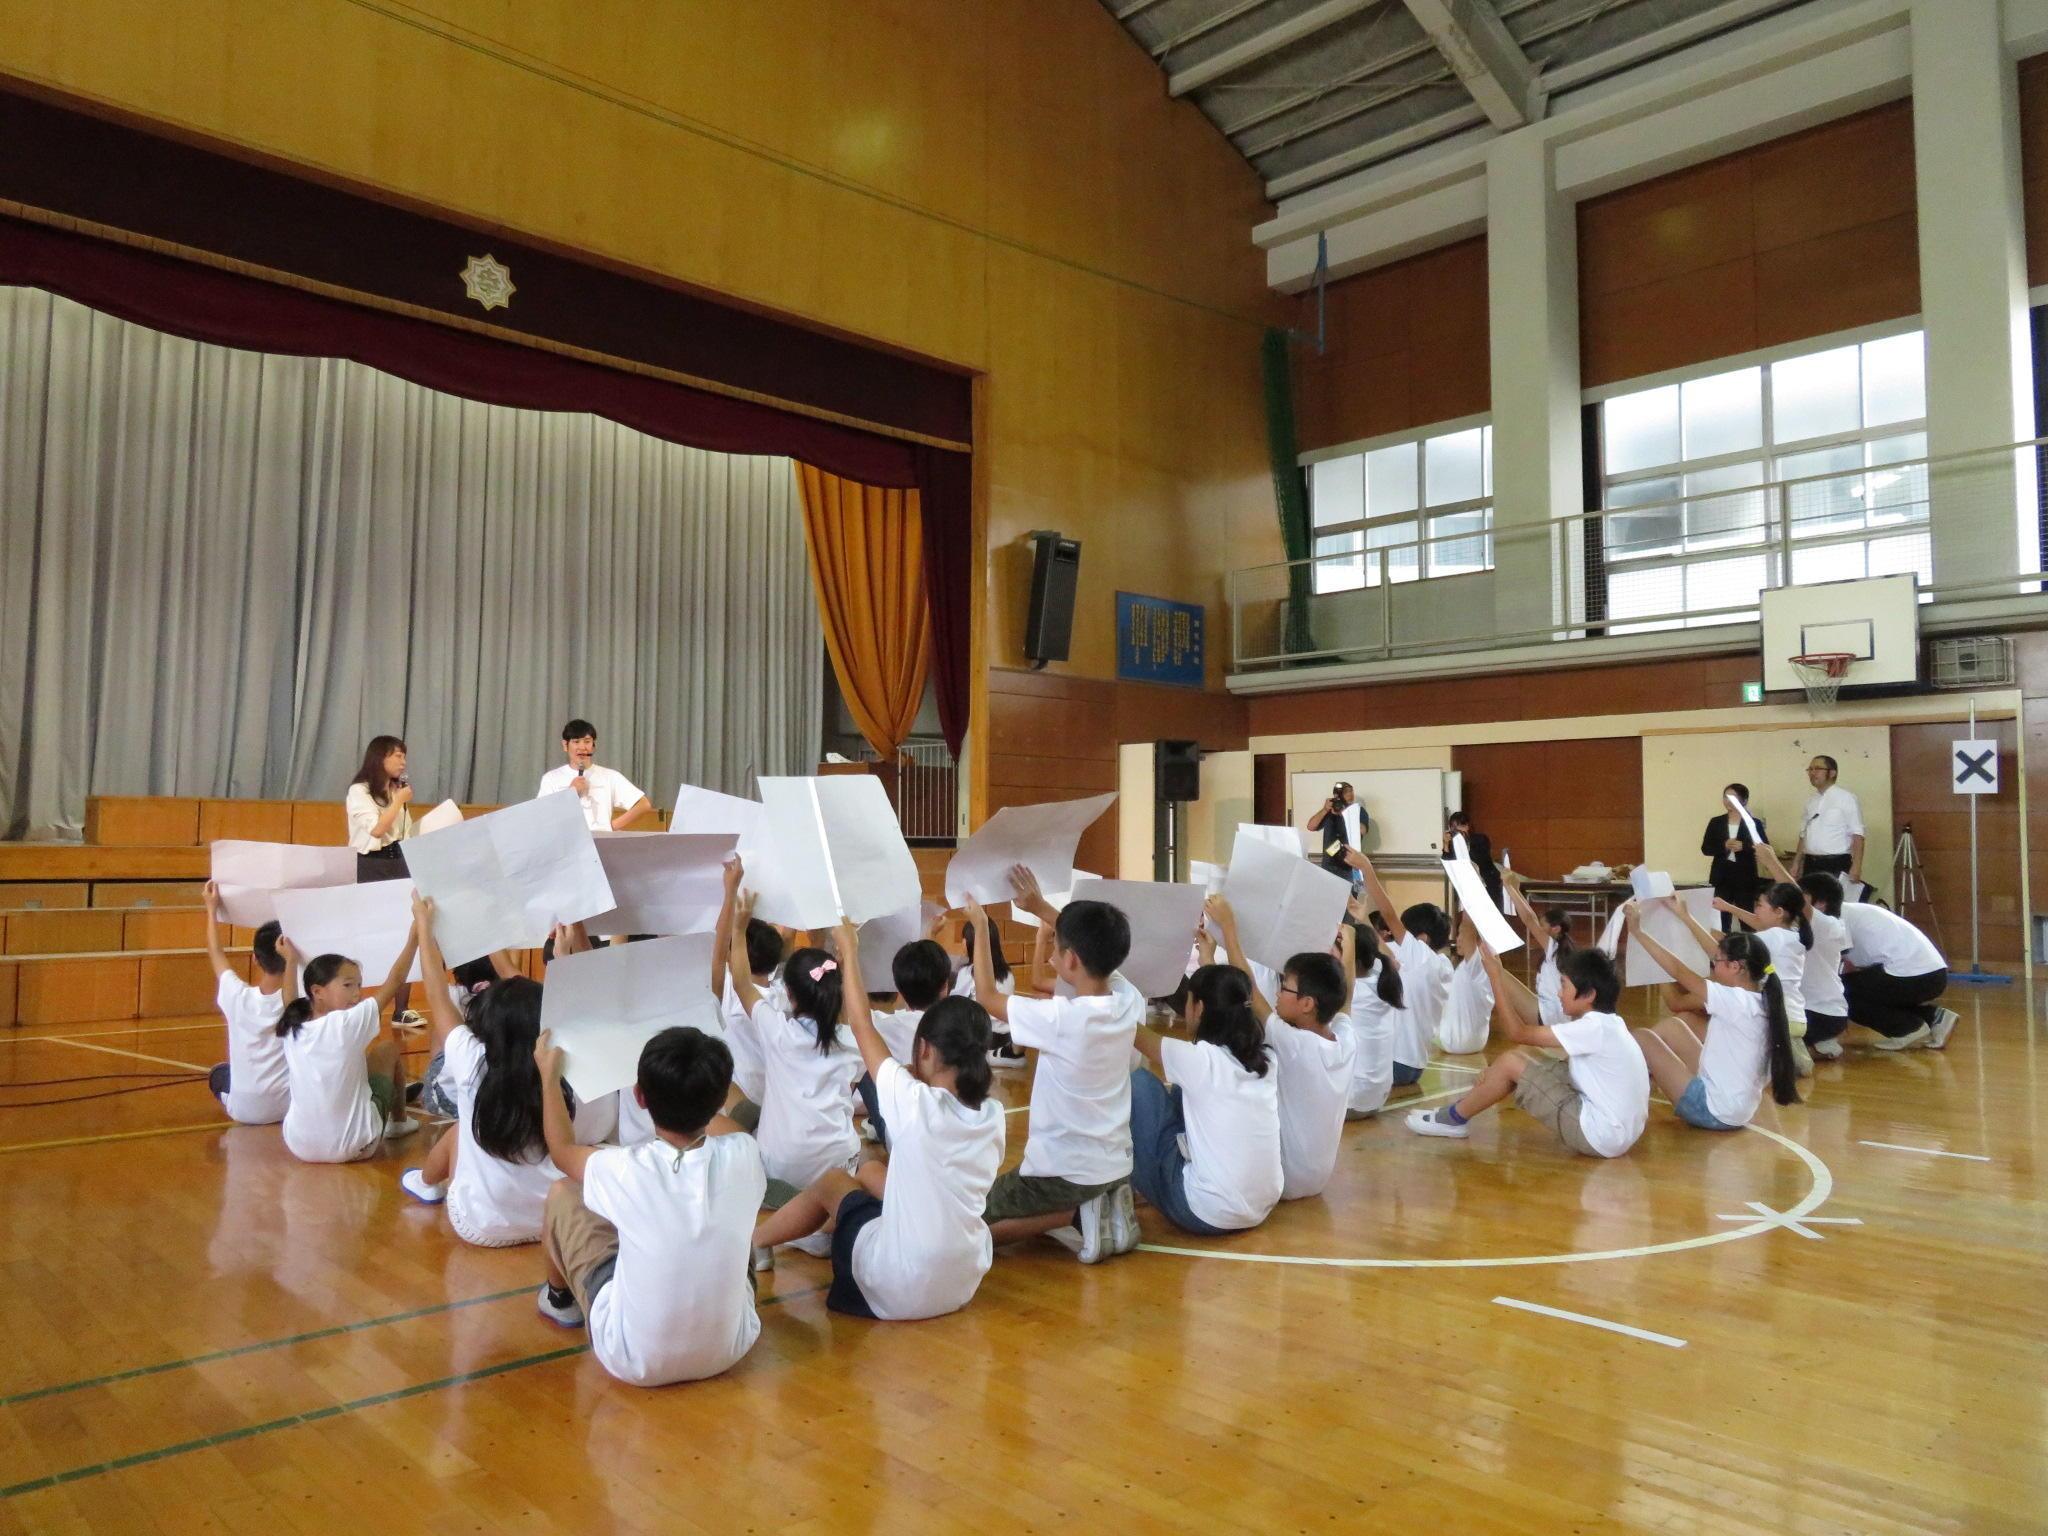 http://news.yoshimoto.co.jp/20181010022737-9668d466425ca4aa2bdda590ea55b6fd4394f494.jpg